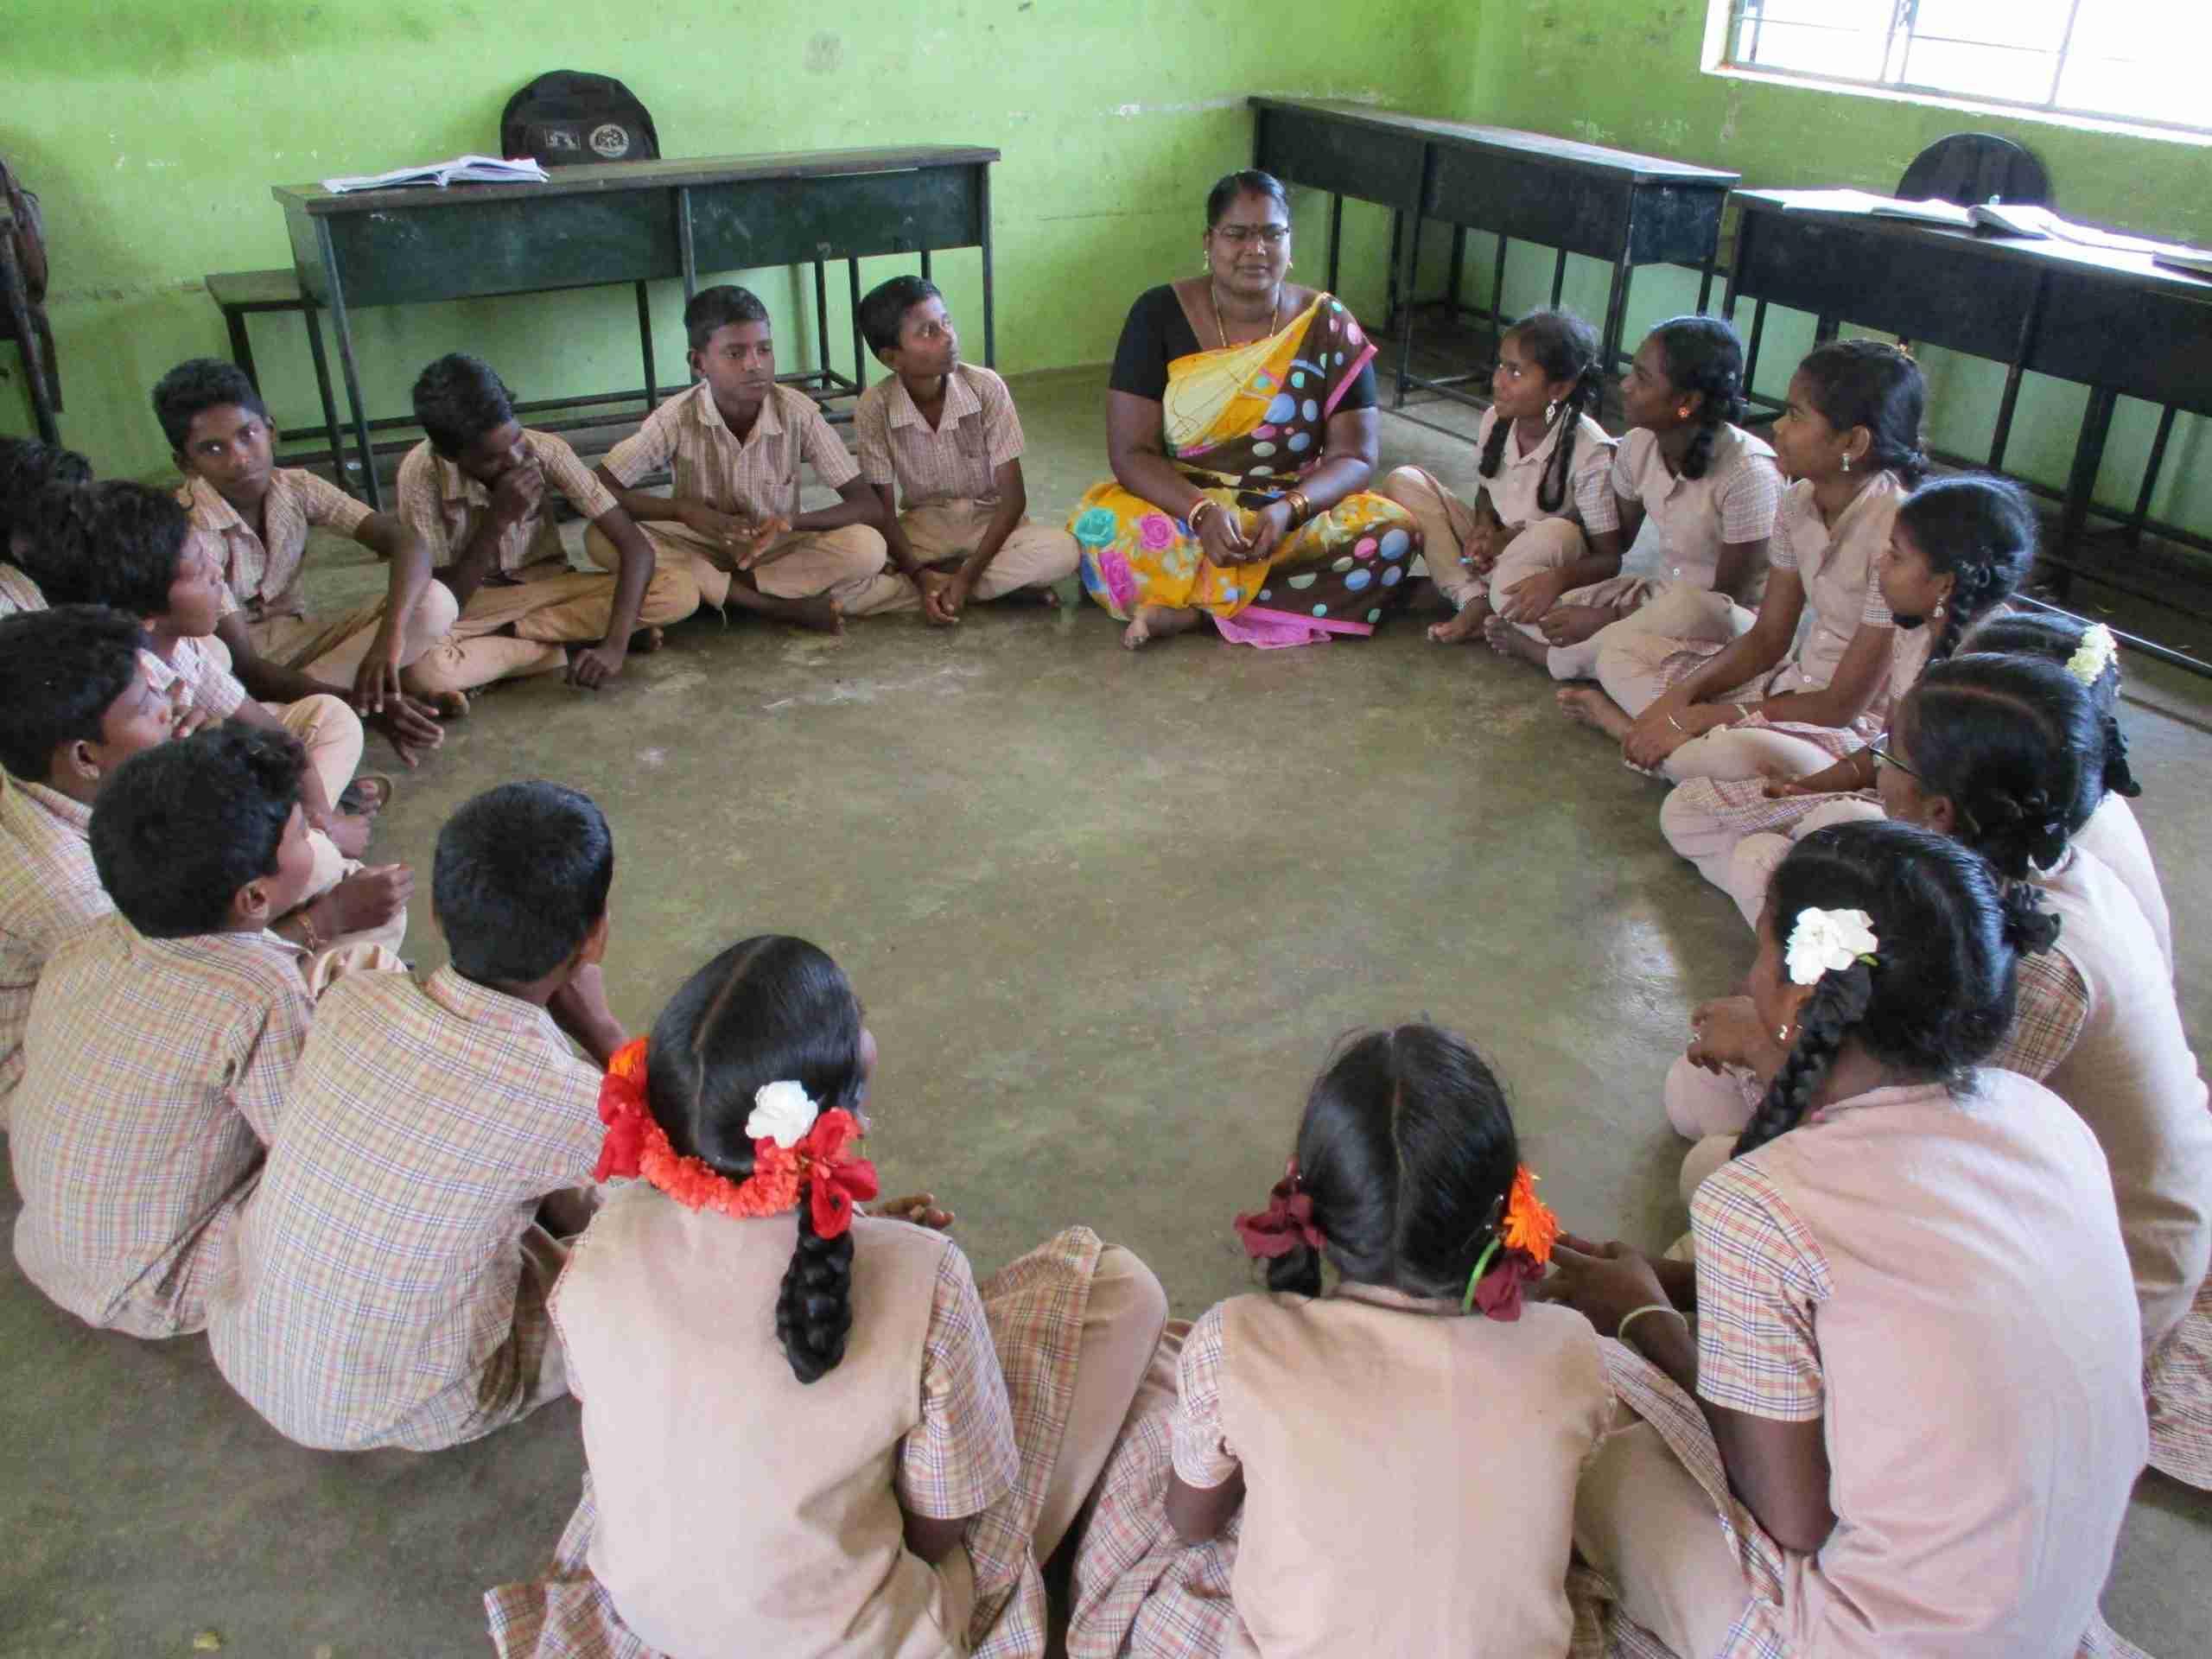 CommunityLeaderIndia1-FieldStory-031920